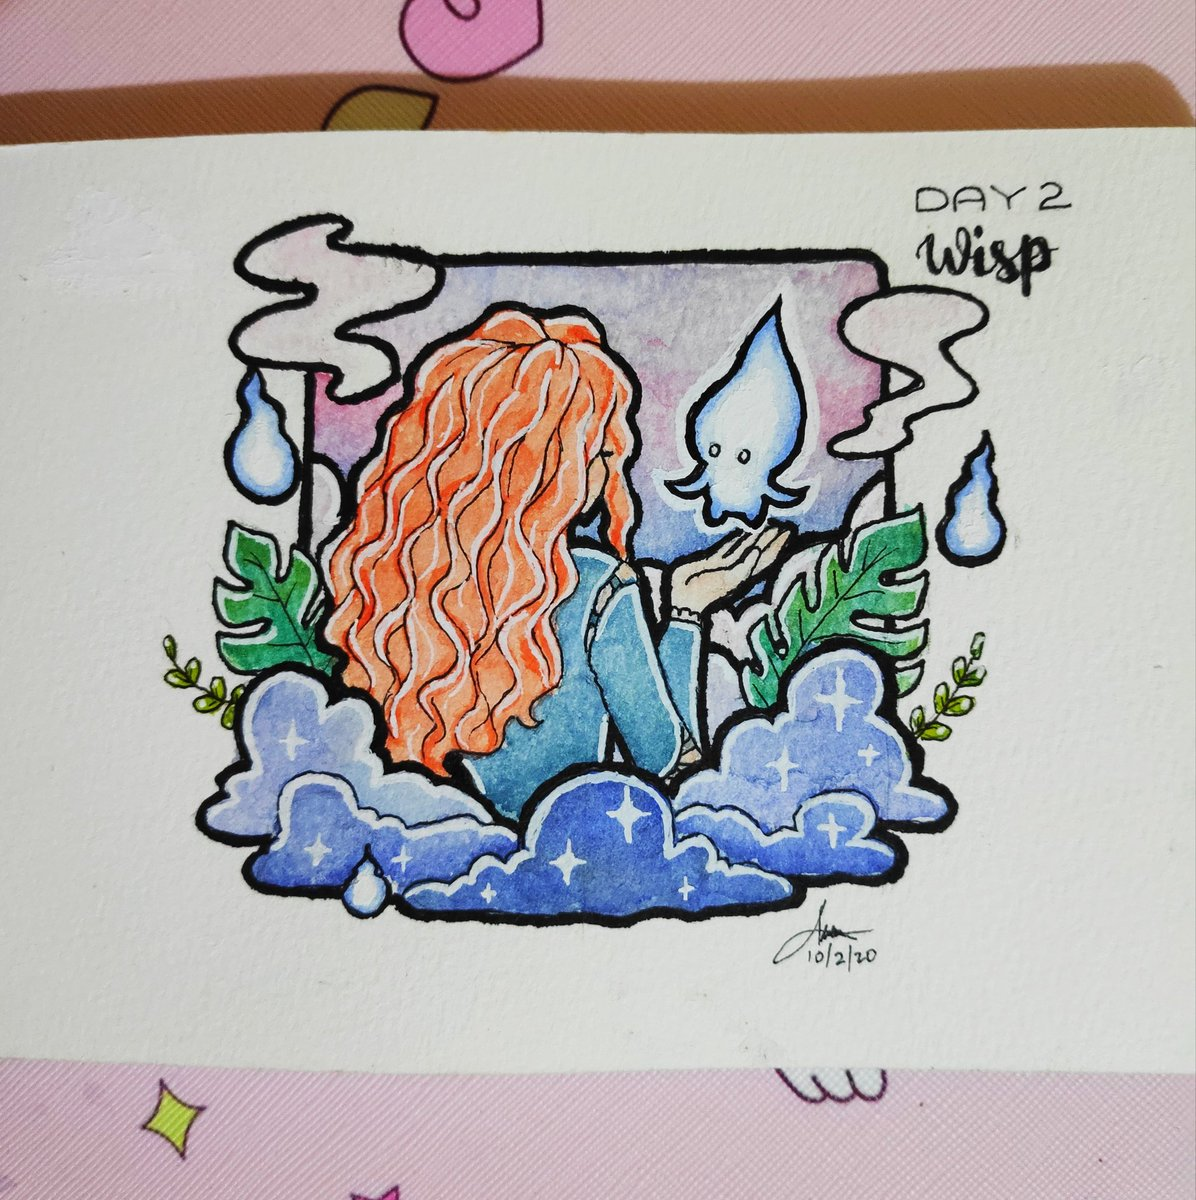 "𝙳𝚊𝚢 𝟸 -  𝙒𝙞𝙨𝙥  ""𝑶𝒖𝒓 𝒇𝒂𝒕𝒆 𝒍𝒊𝒗𝒆𝒔 𝒘𝒊𝒕𝒉𝒊𝒏 𝒖𝒔. 𝒀𝒐𝒖 𝒐𝒏𝒍𝒚 𝒉𝒂𝒗𝒆 𝒕𝒐 𝒃𝒆 𝒃𝒓𝒂𝒗𝒆 𝒆𝒏𝒐𝒖𝒈𝒉 𝒕𝒐 𝒔𝒆𝒆 𝒊𝒕""  ~𝑩𝒓𝒂𝒗𝒆  #inktober #inktober2020 #inktoberday2 #inktoberchallenge #watercolor #aesthetics #aesthetic #disney #disneybrave"